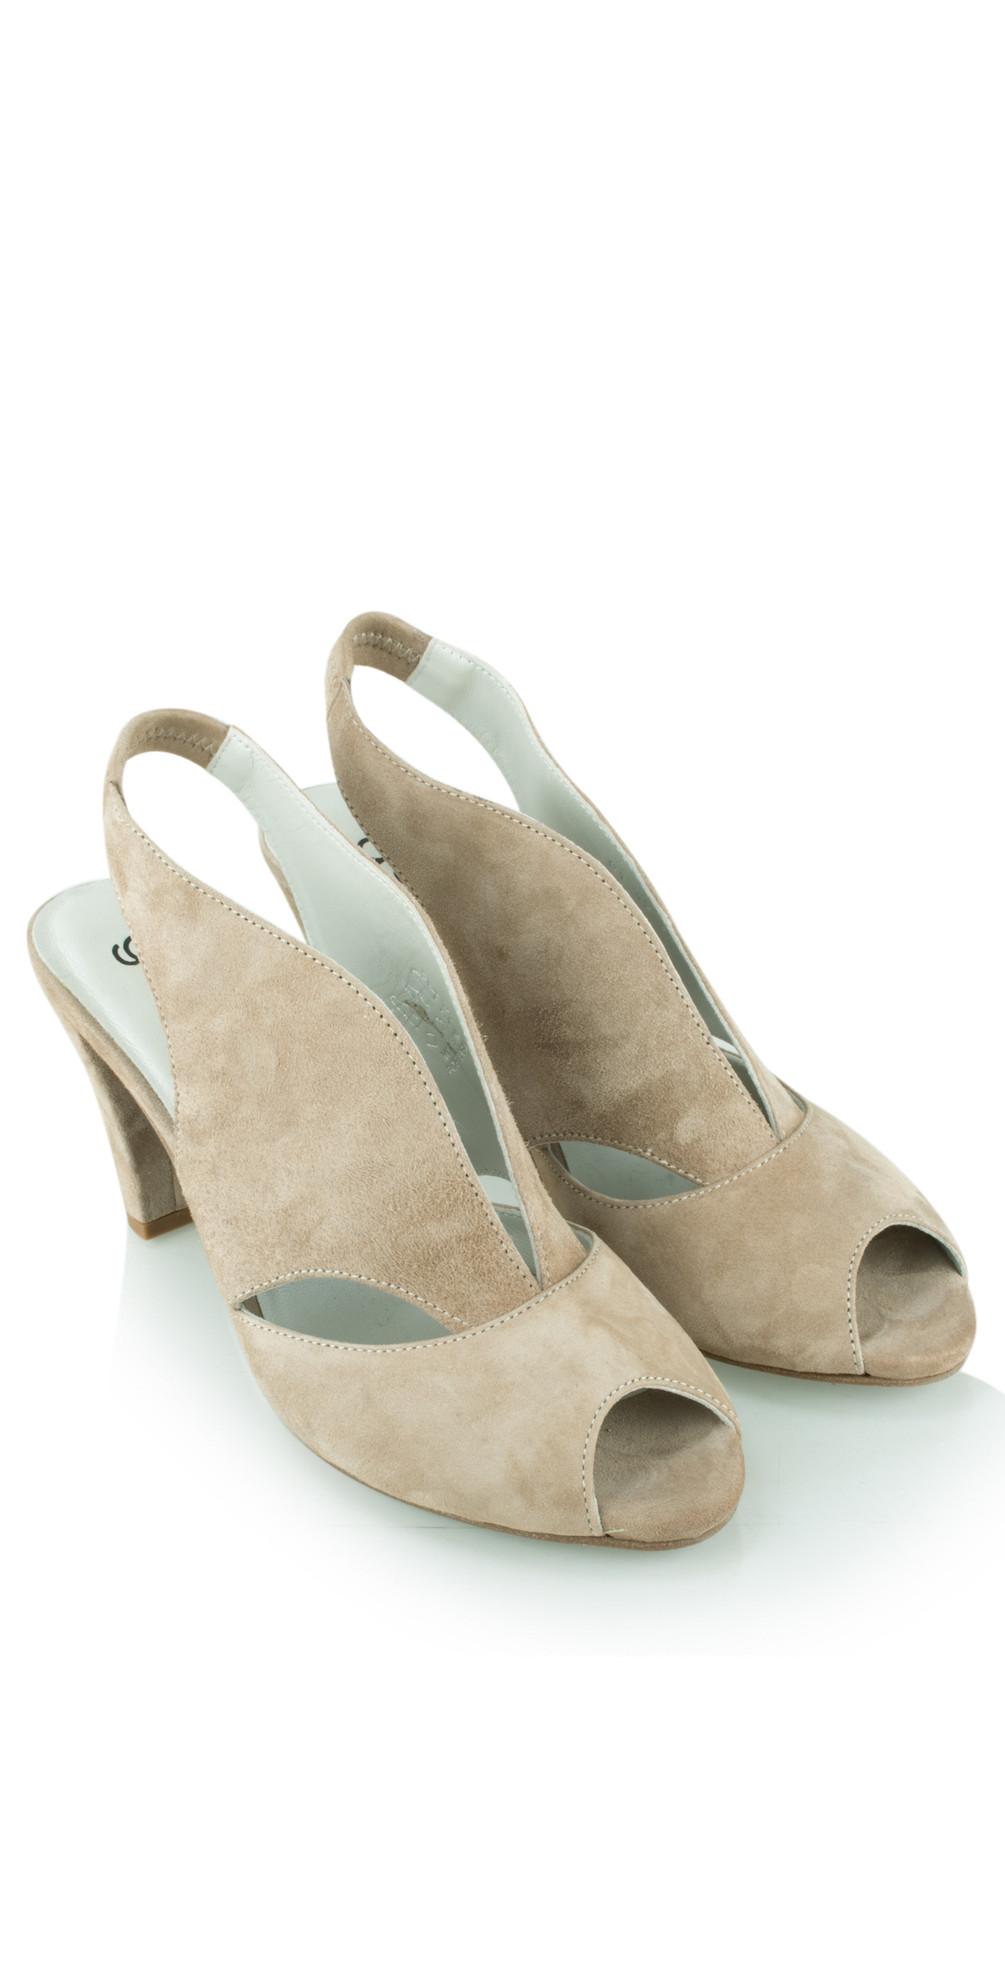 Valencia Sandal Shoe main image